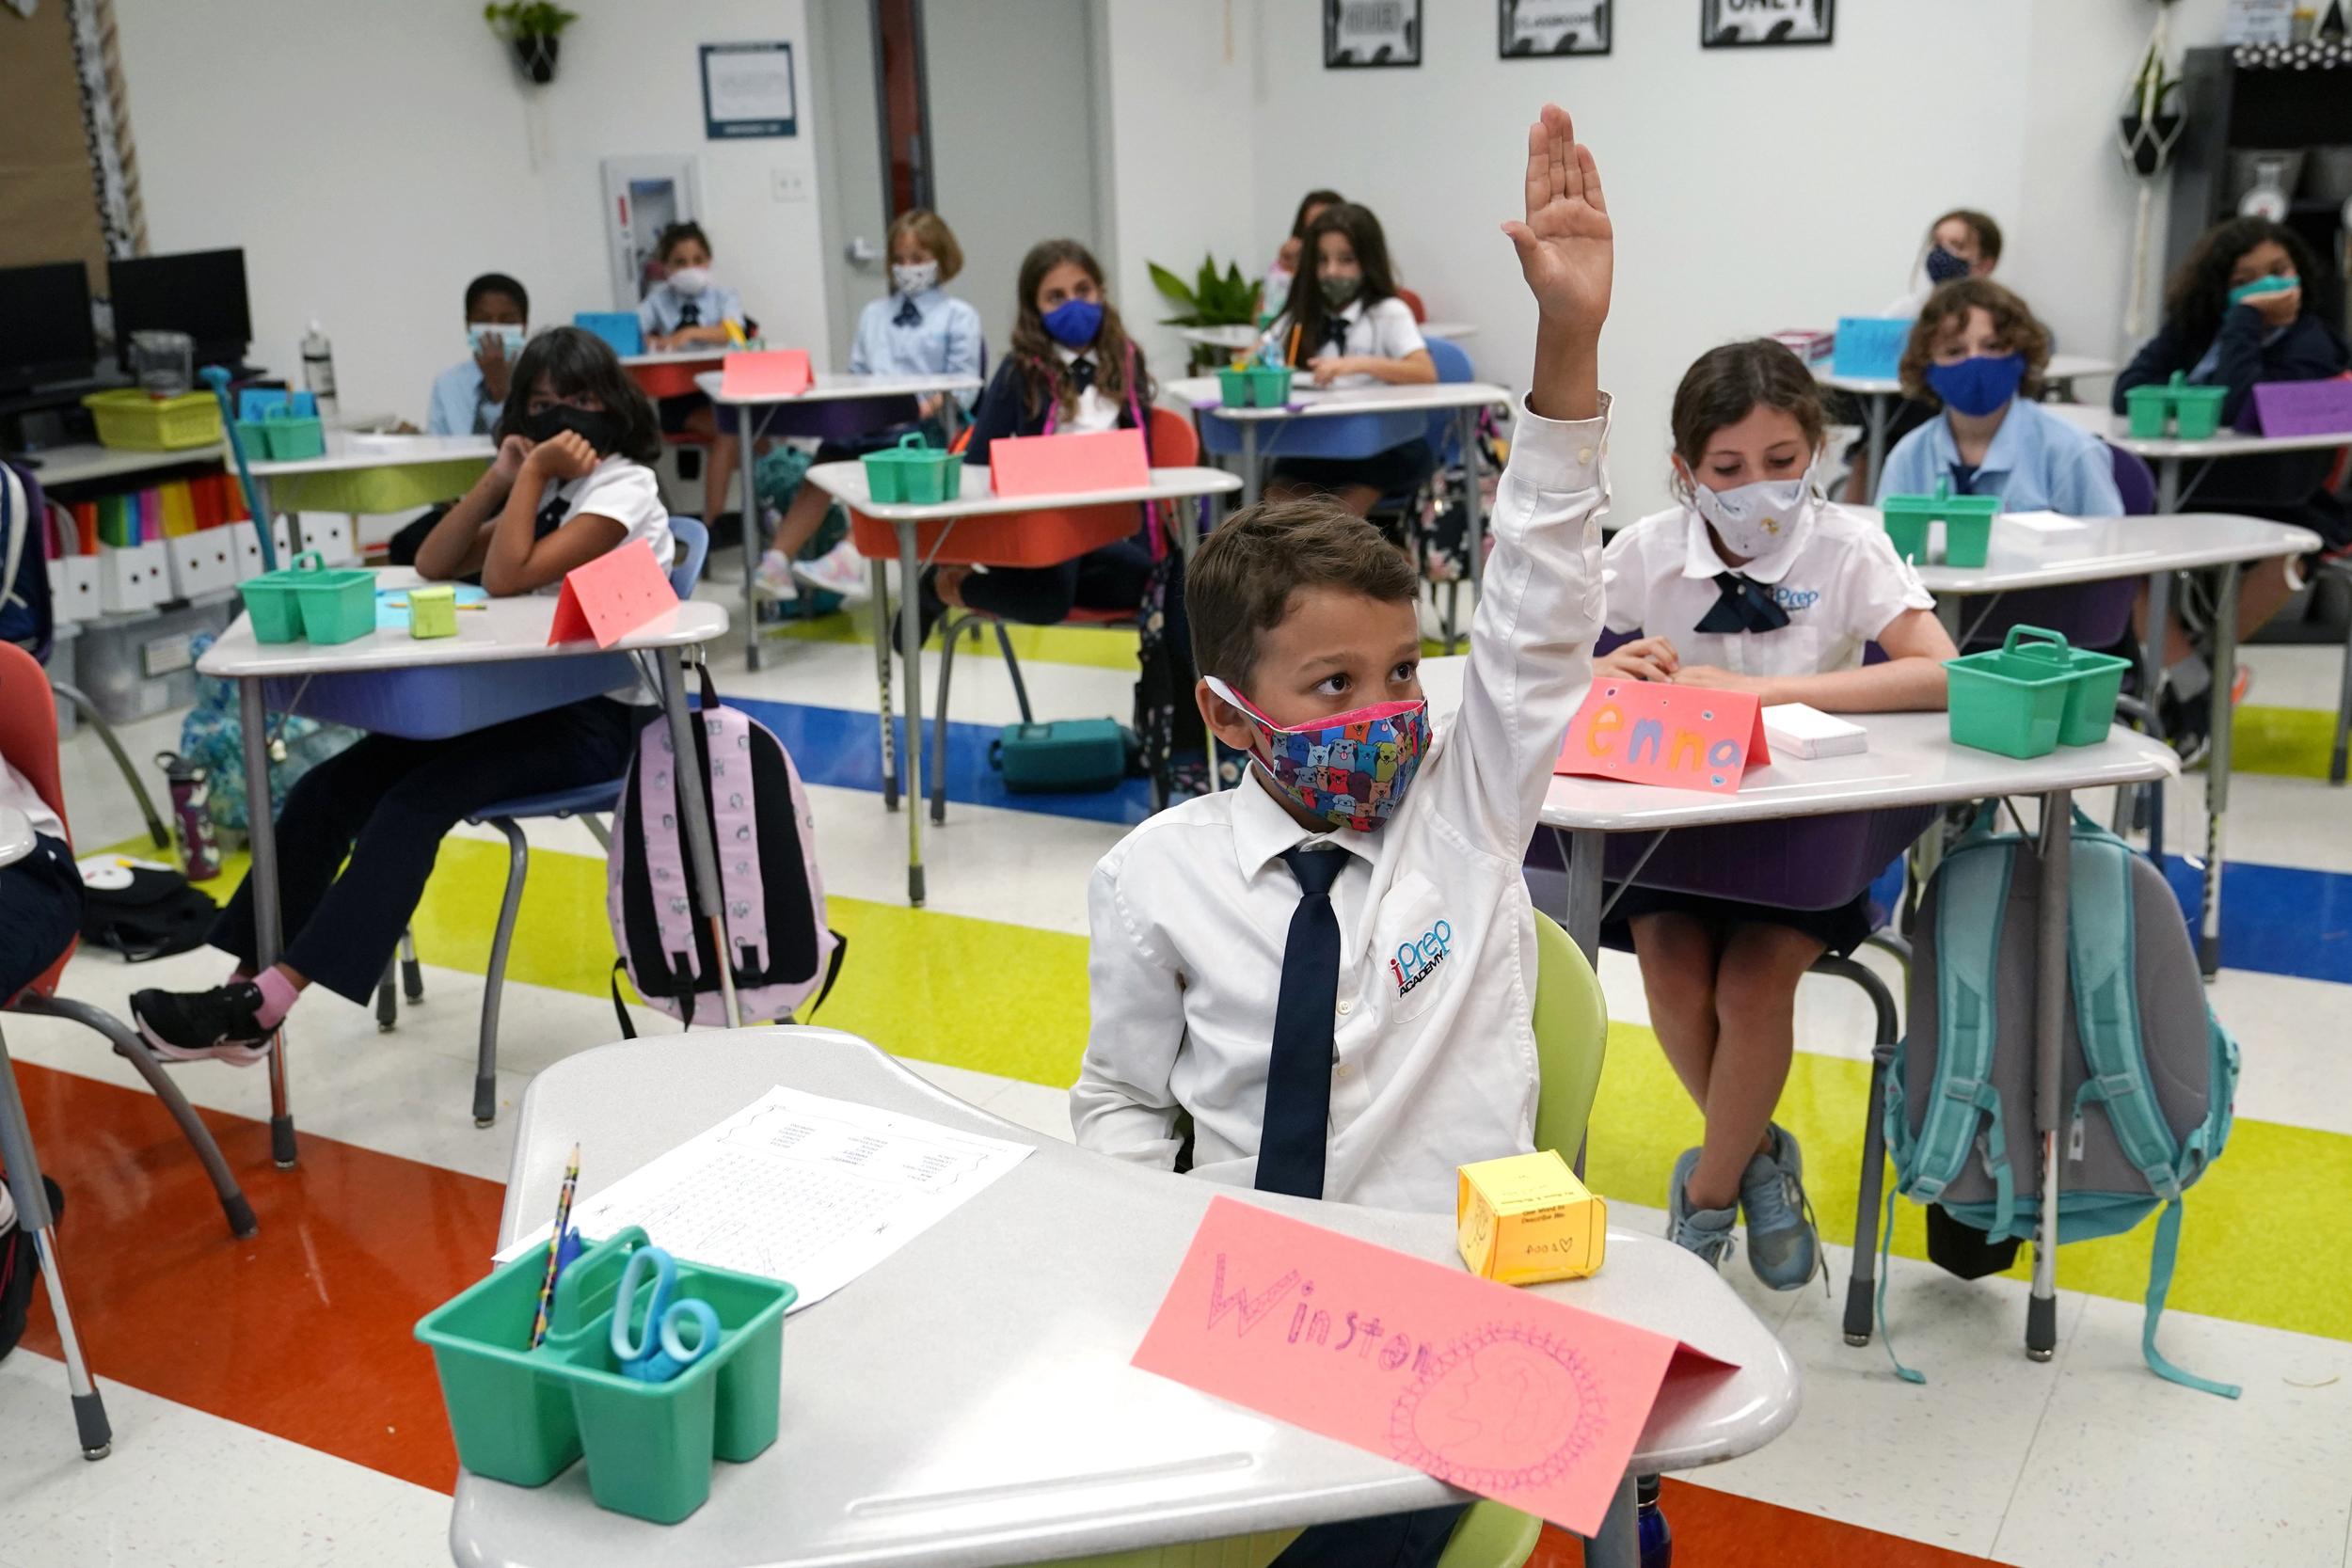 DeSantis' ban on Florida schools mask mandates reinstated for now